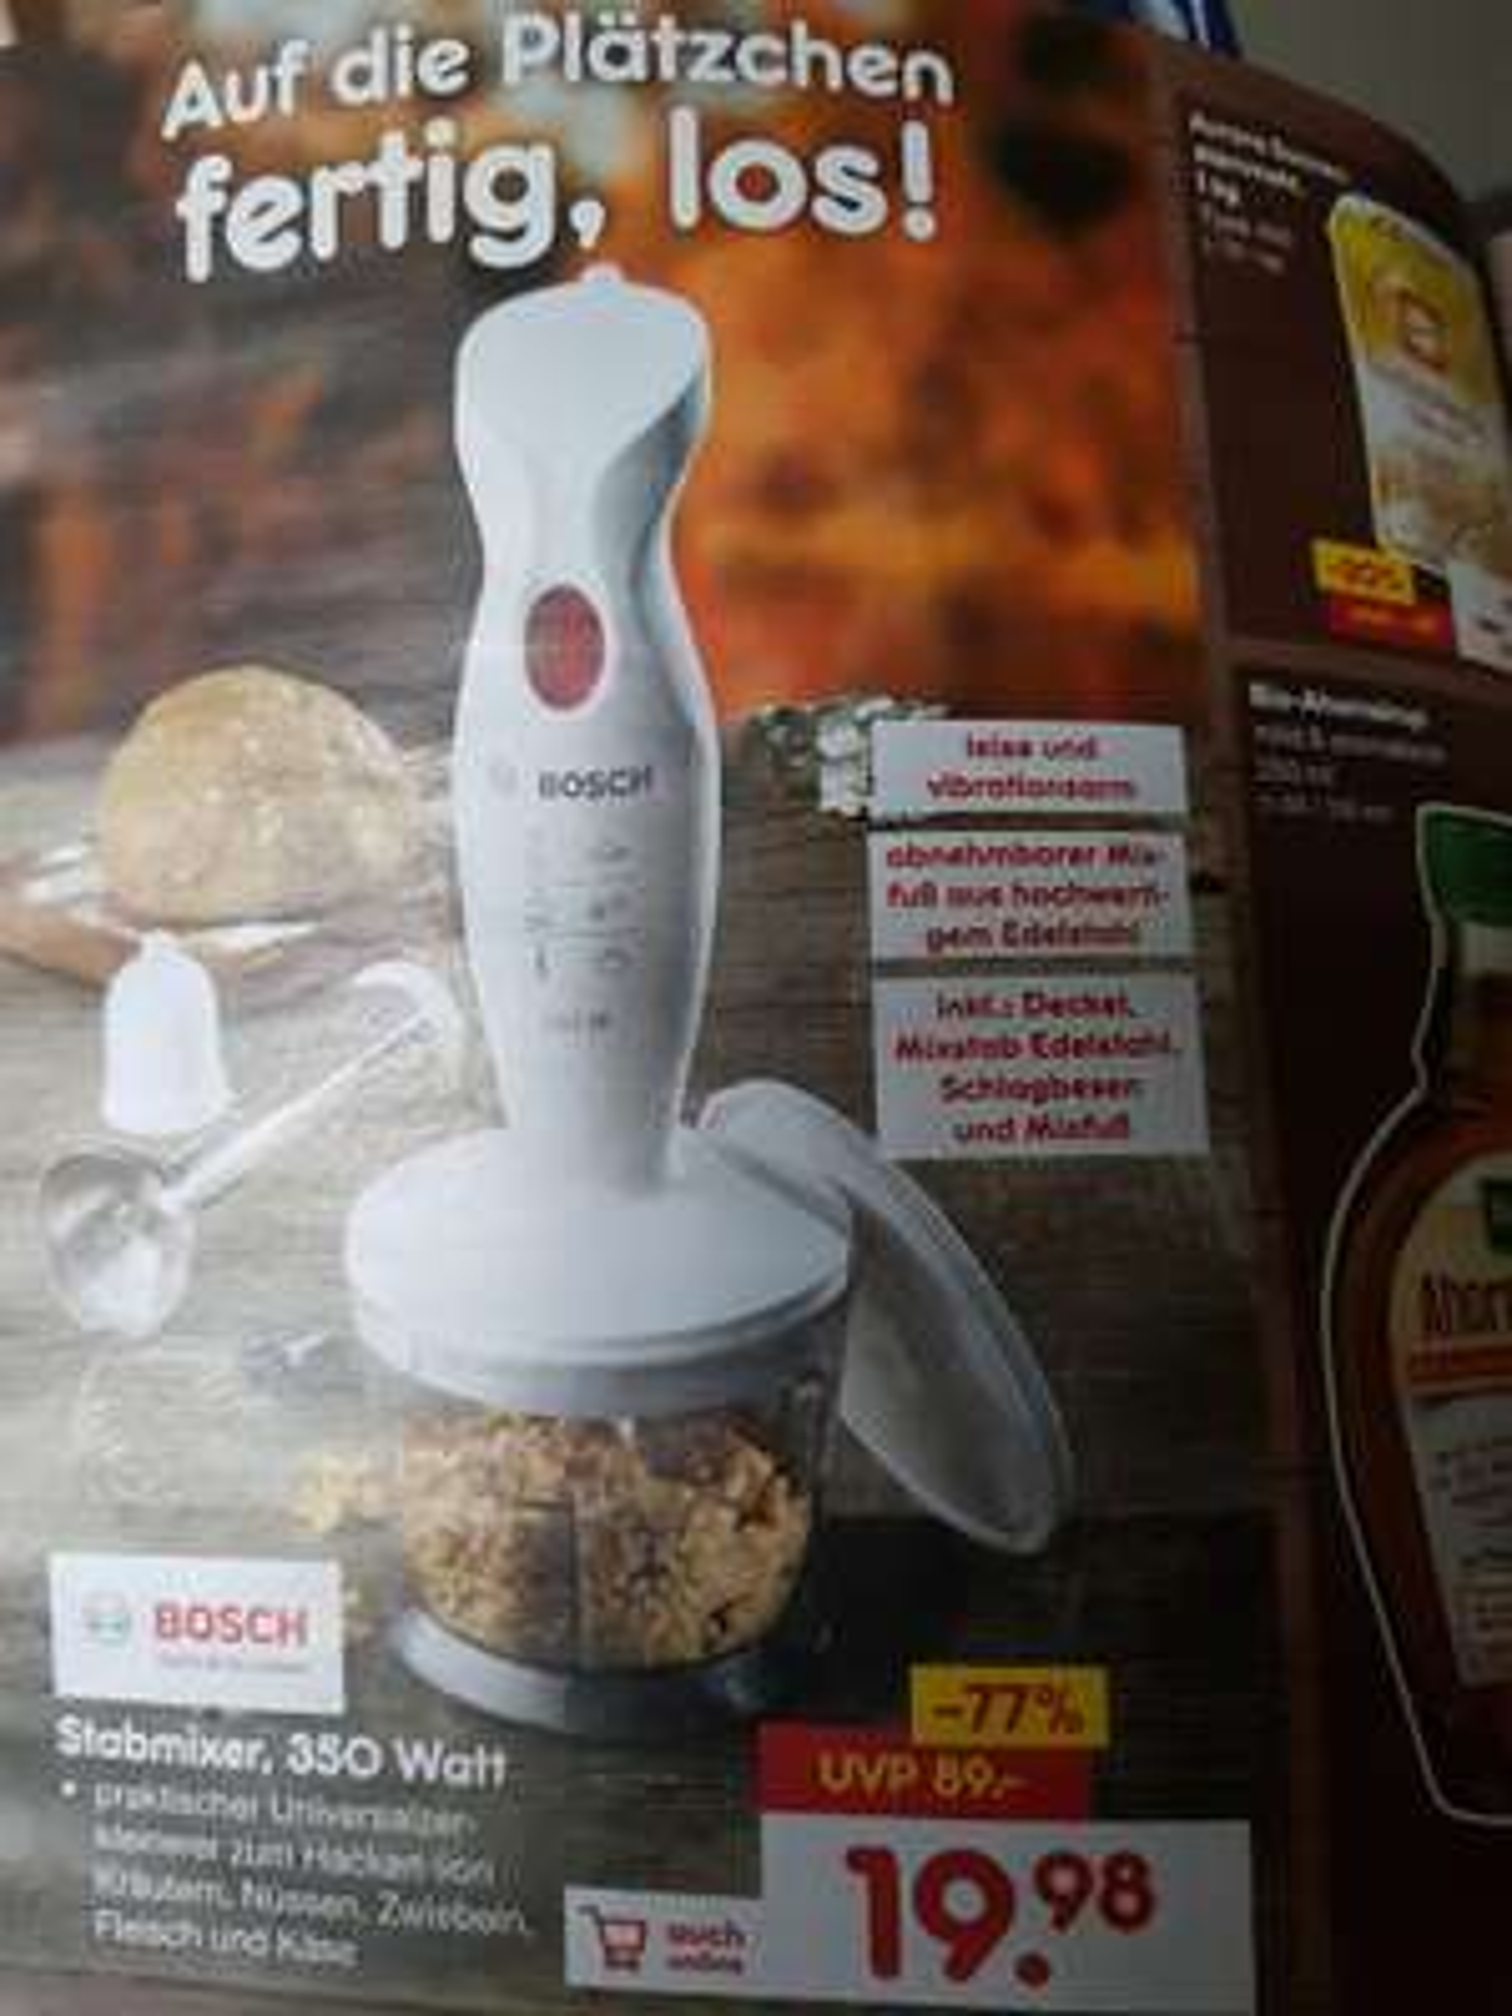 Bosch Stabmixer 350 Watt im Netto Marken-Discount